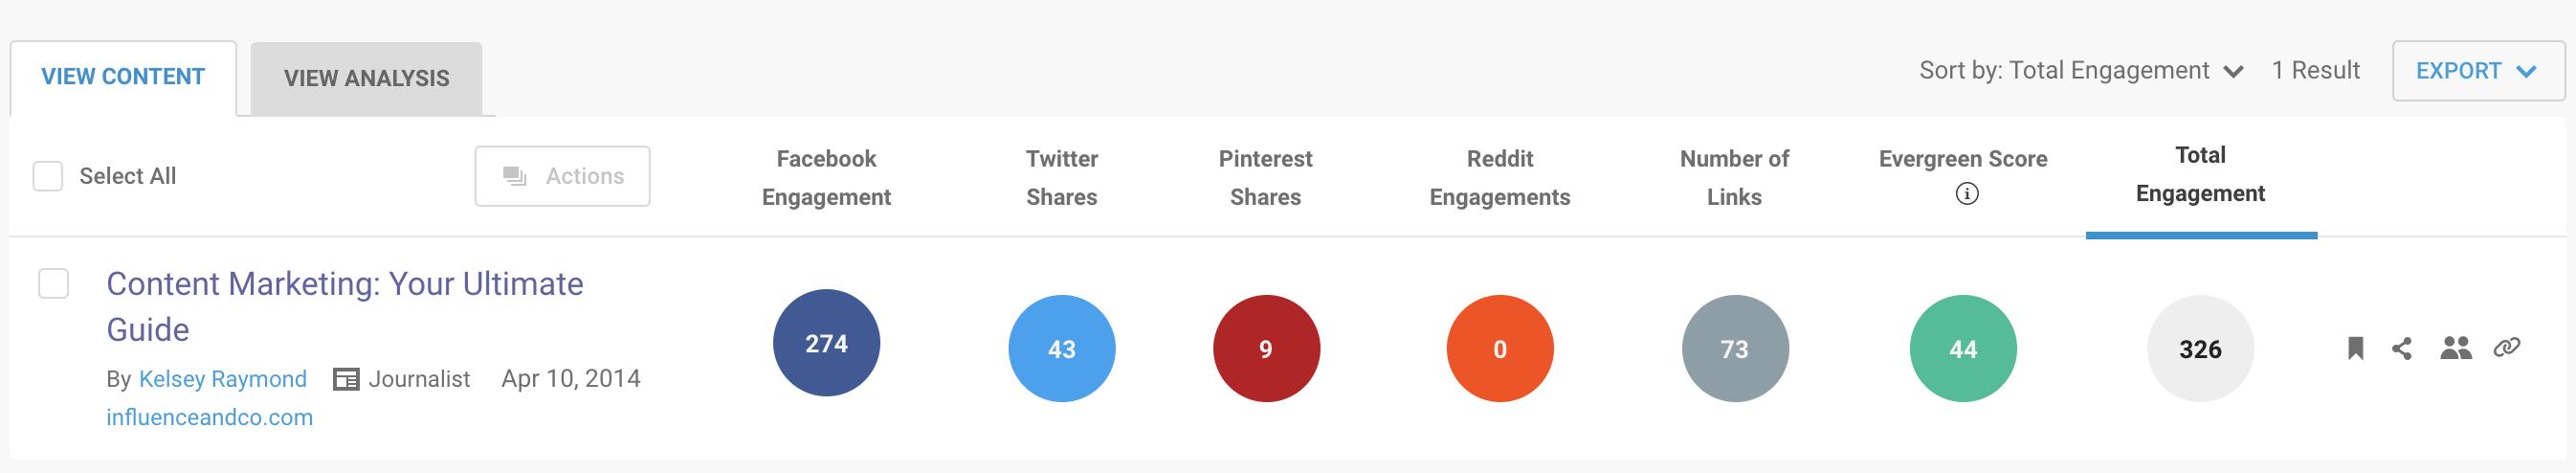 Blog post share metrics in BuzzSumo